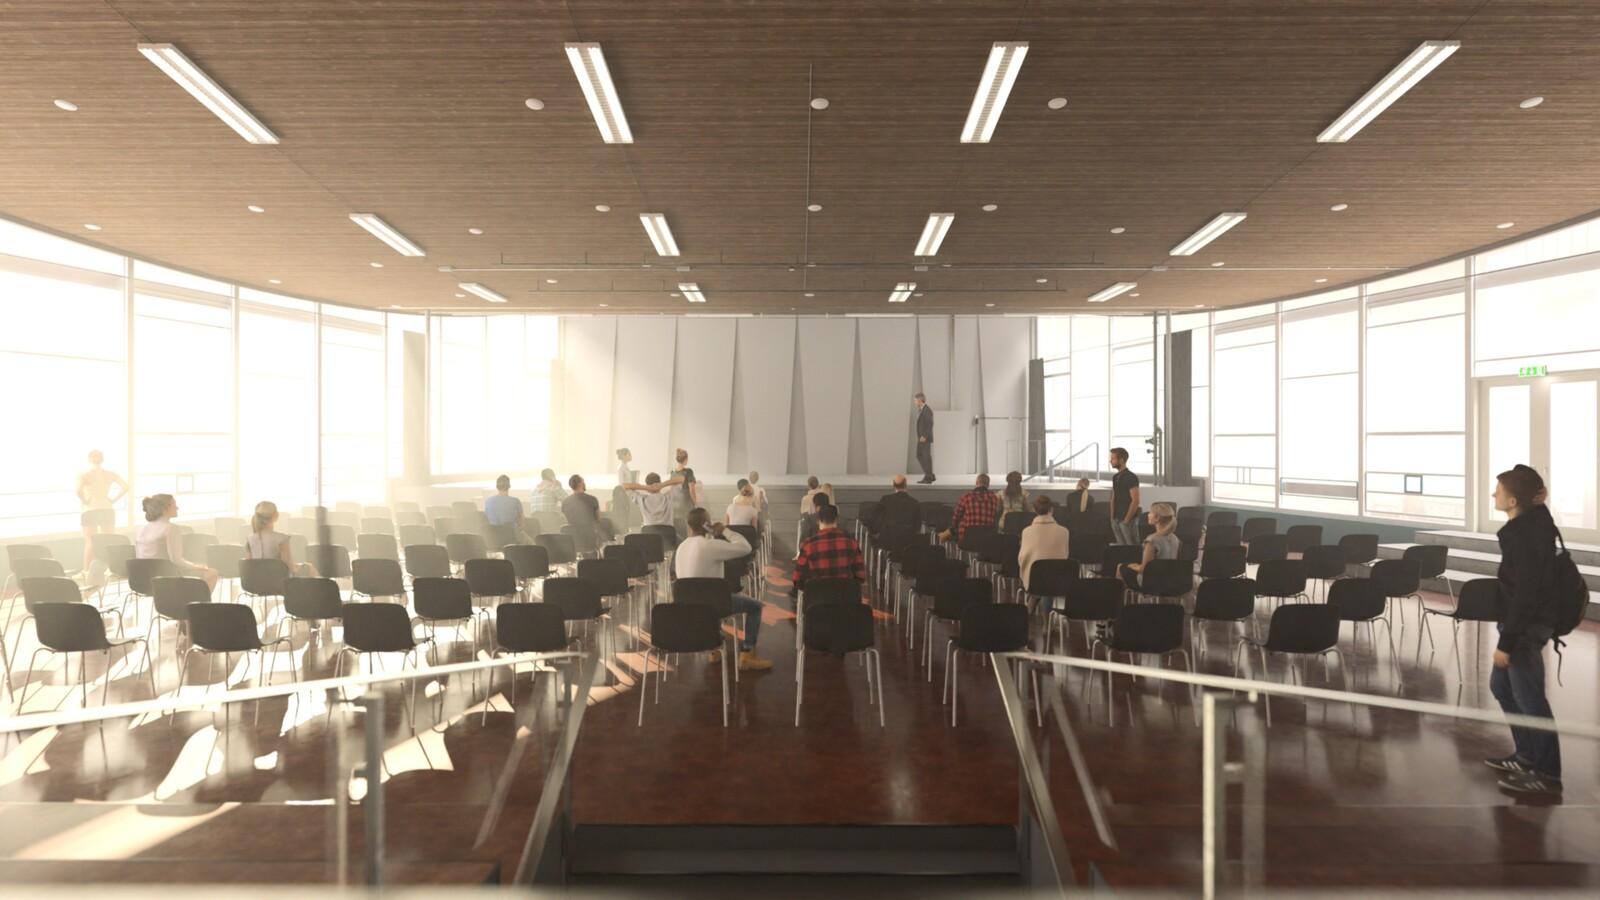 #SketchUp 2021 + #Thea Render V3 Broedplaats LELY (The Lely Incubator) Auditorium Amsterdam Showroom-Scene 1C 19m HD1080 1536sp